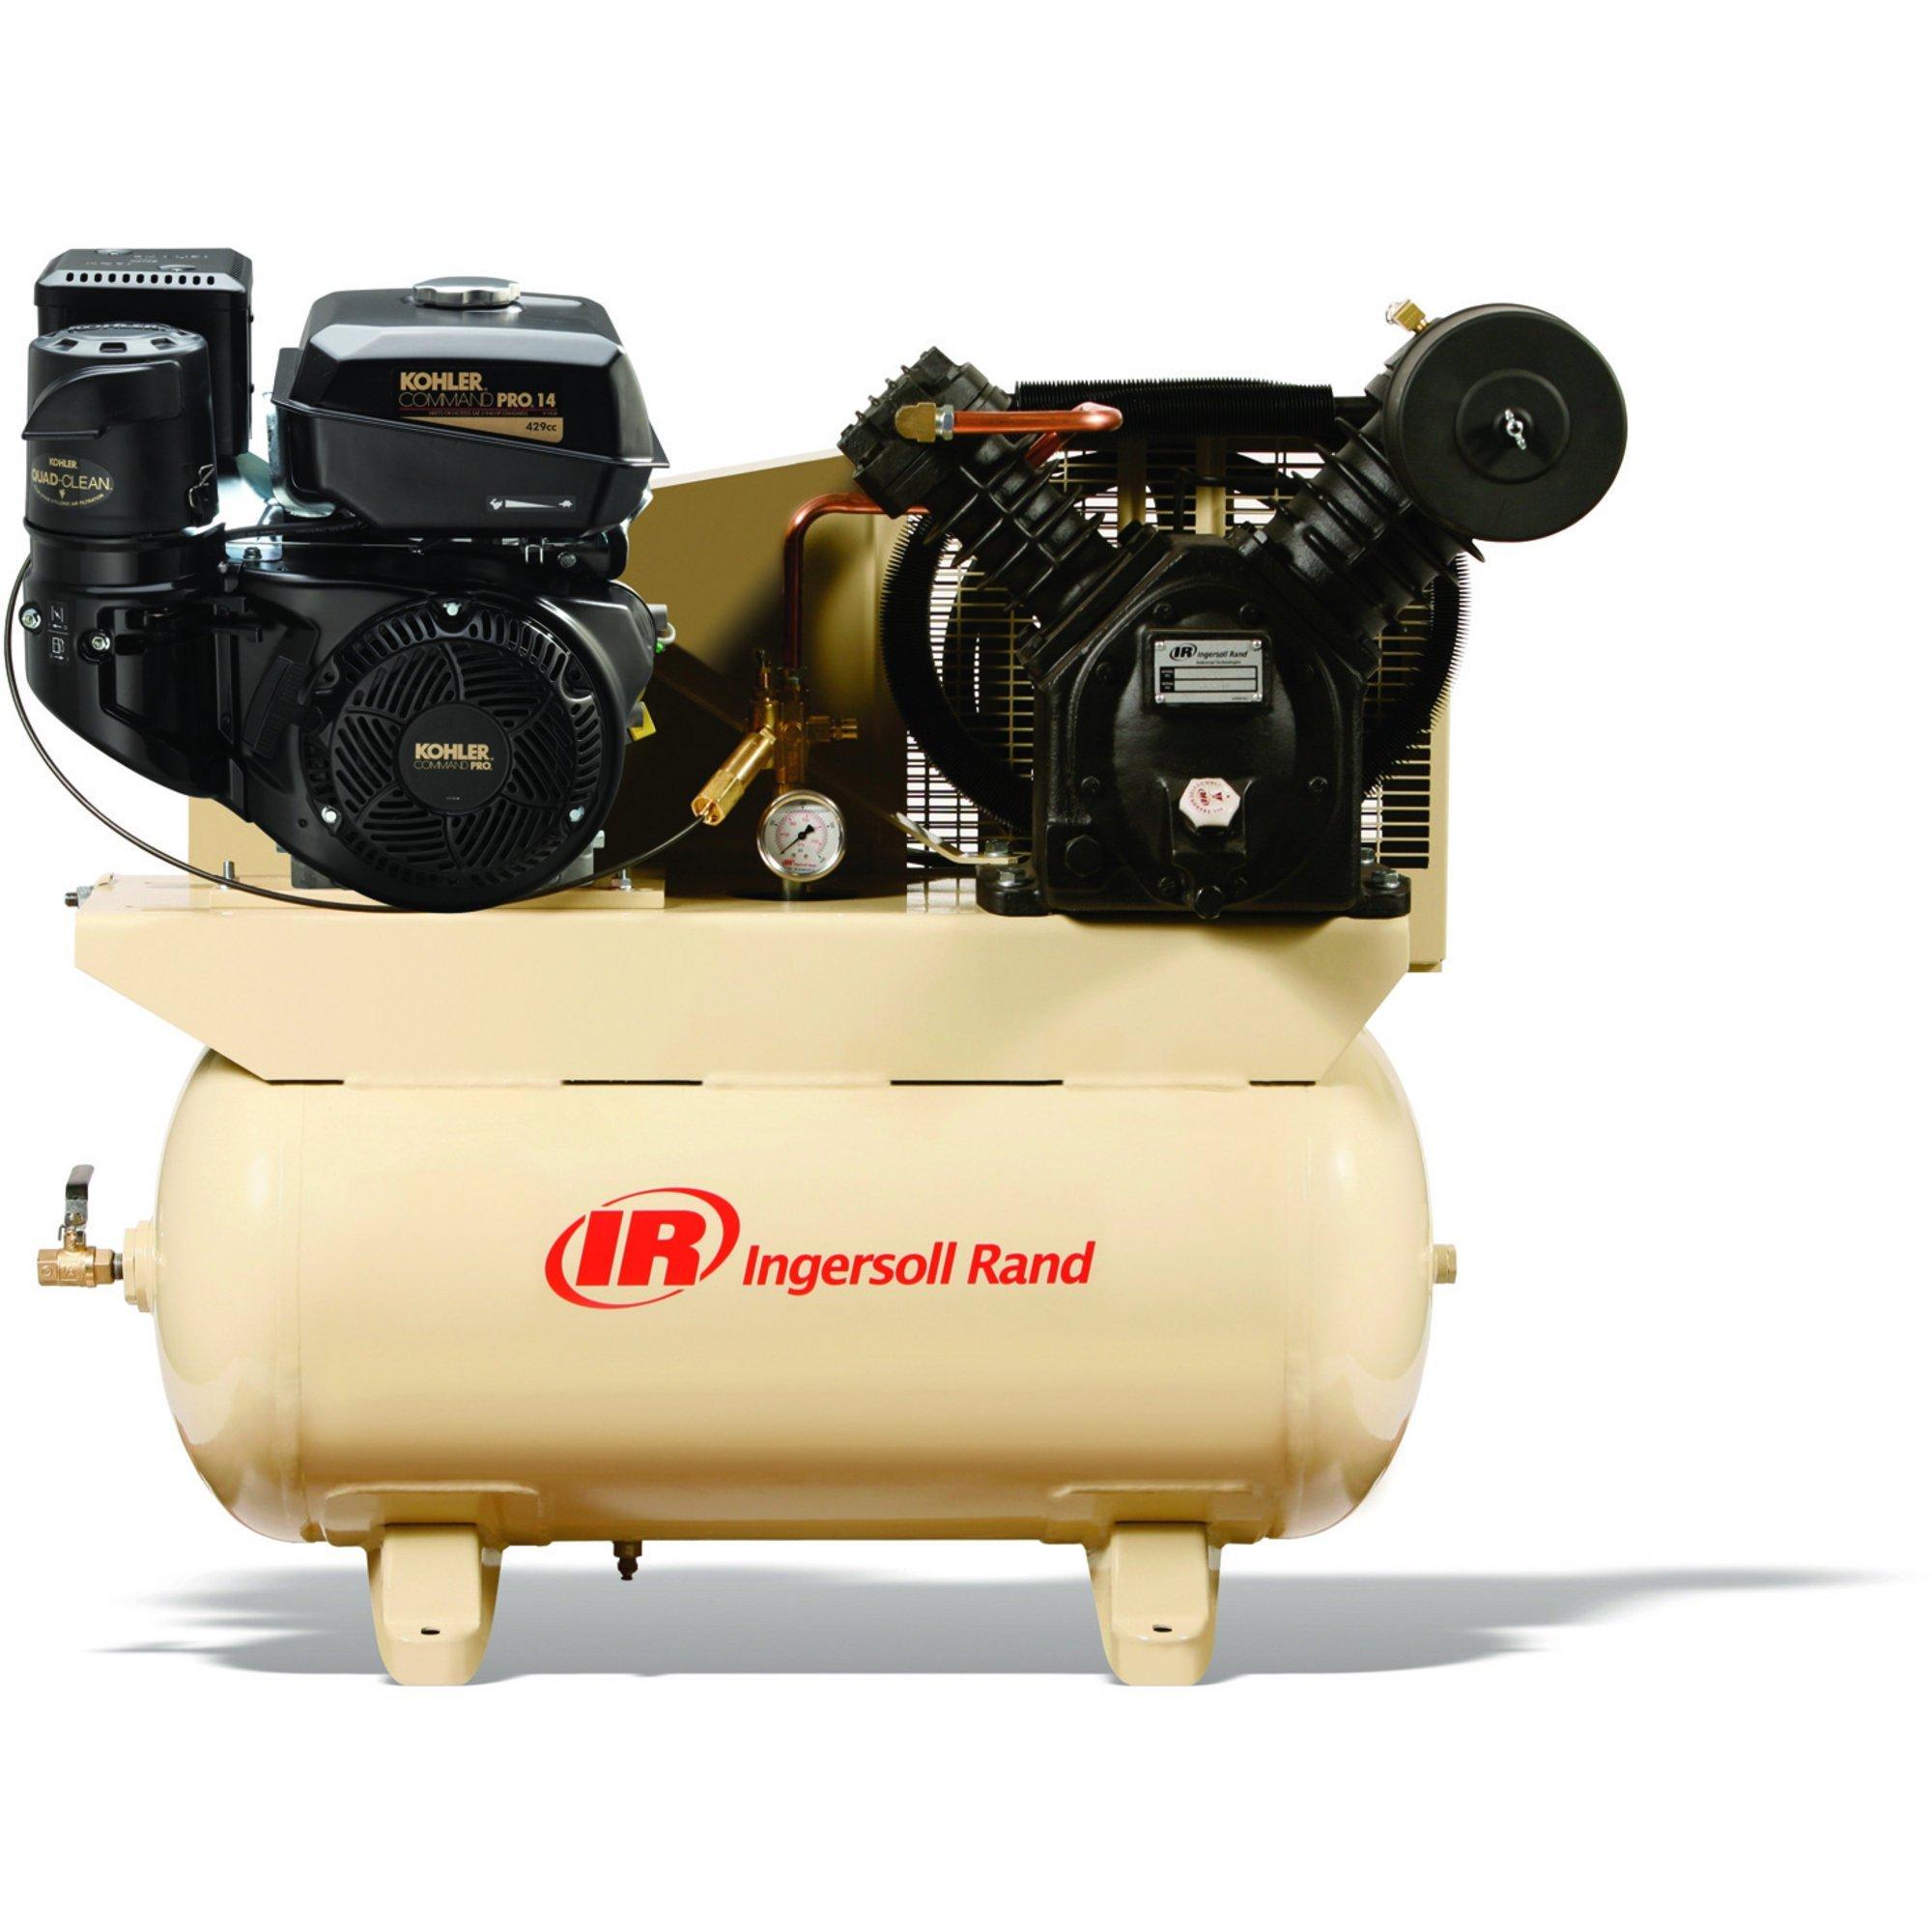 hight resolution of 2475f13g kohler air compressor